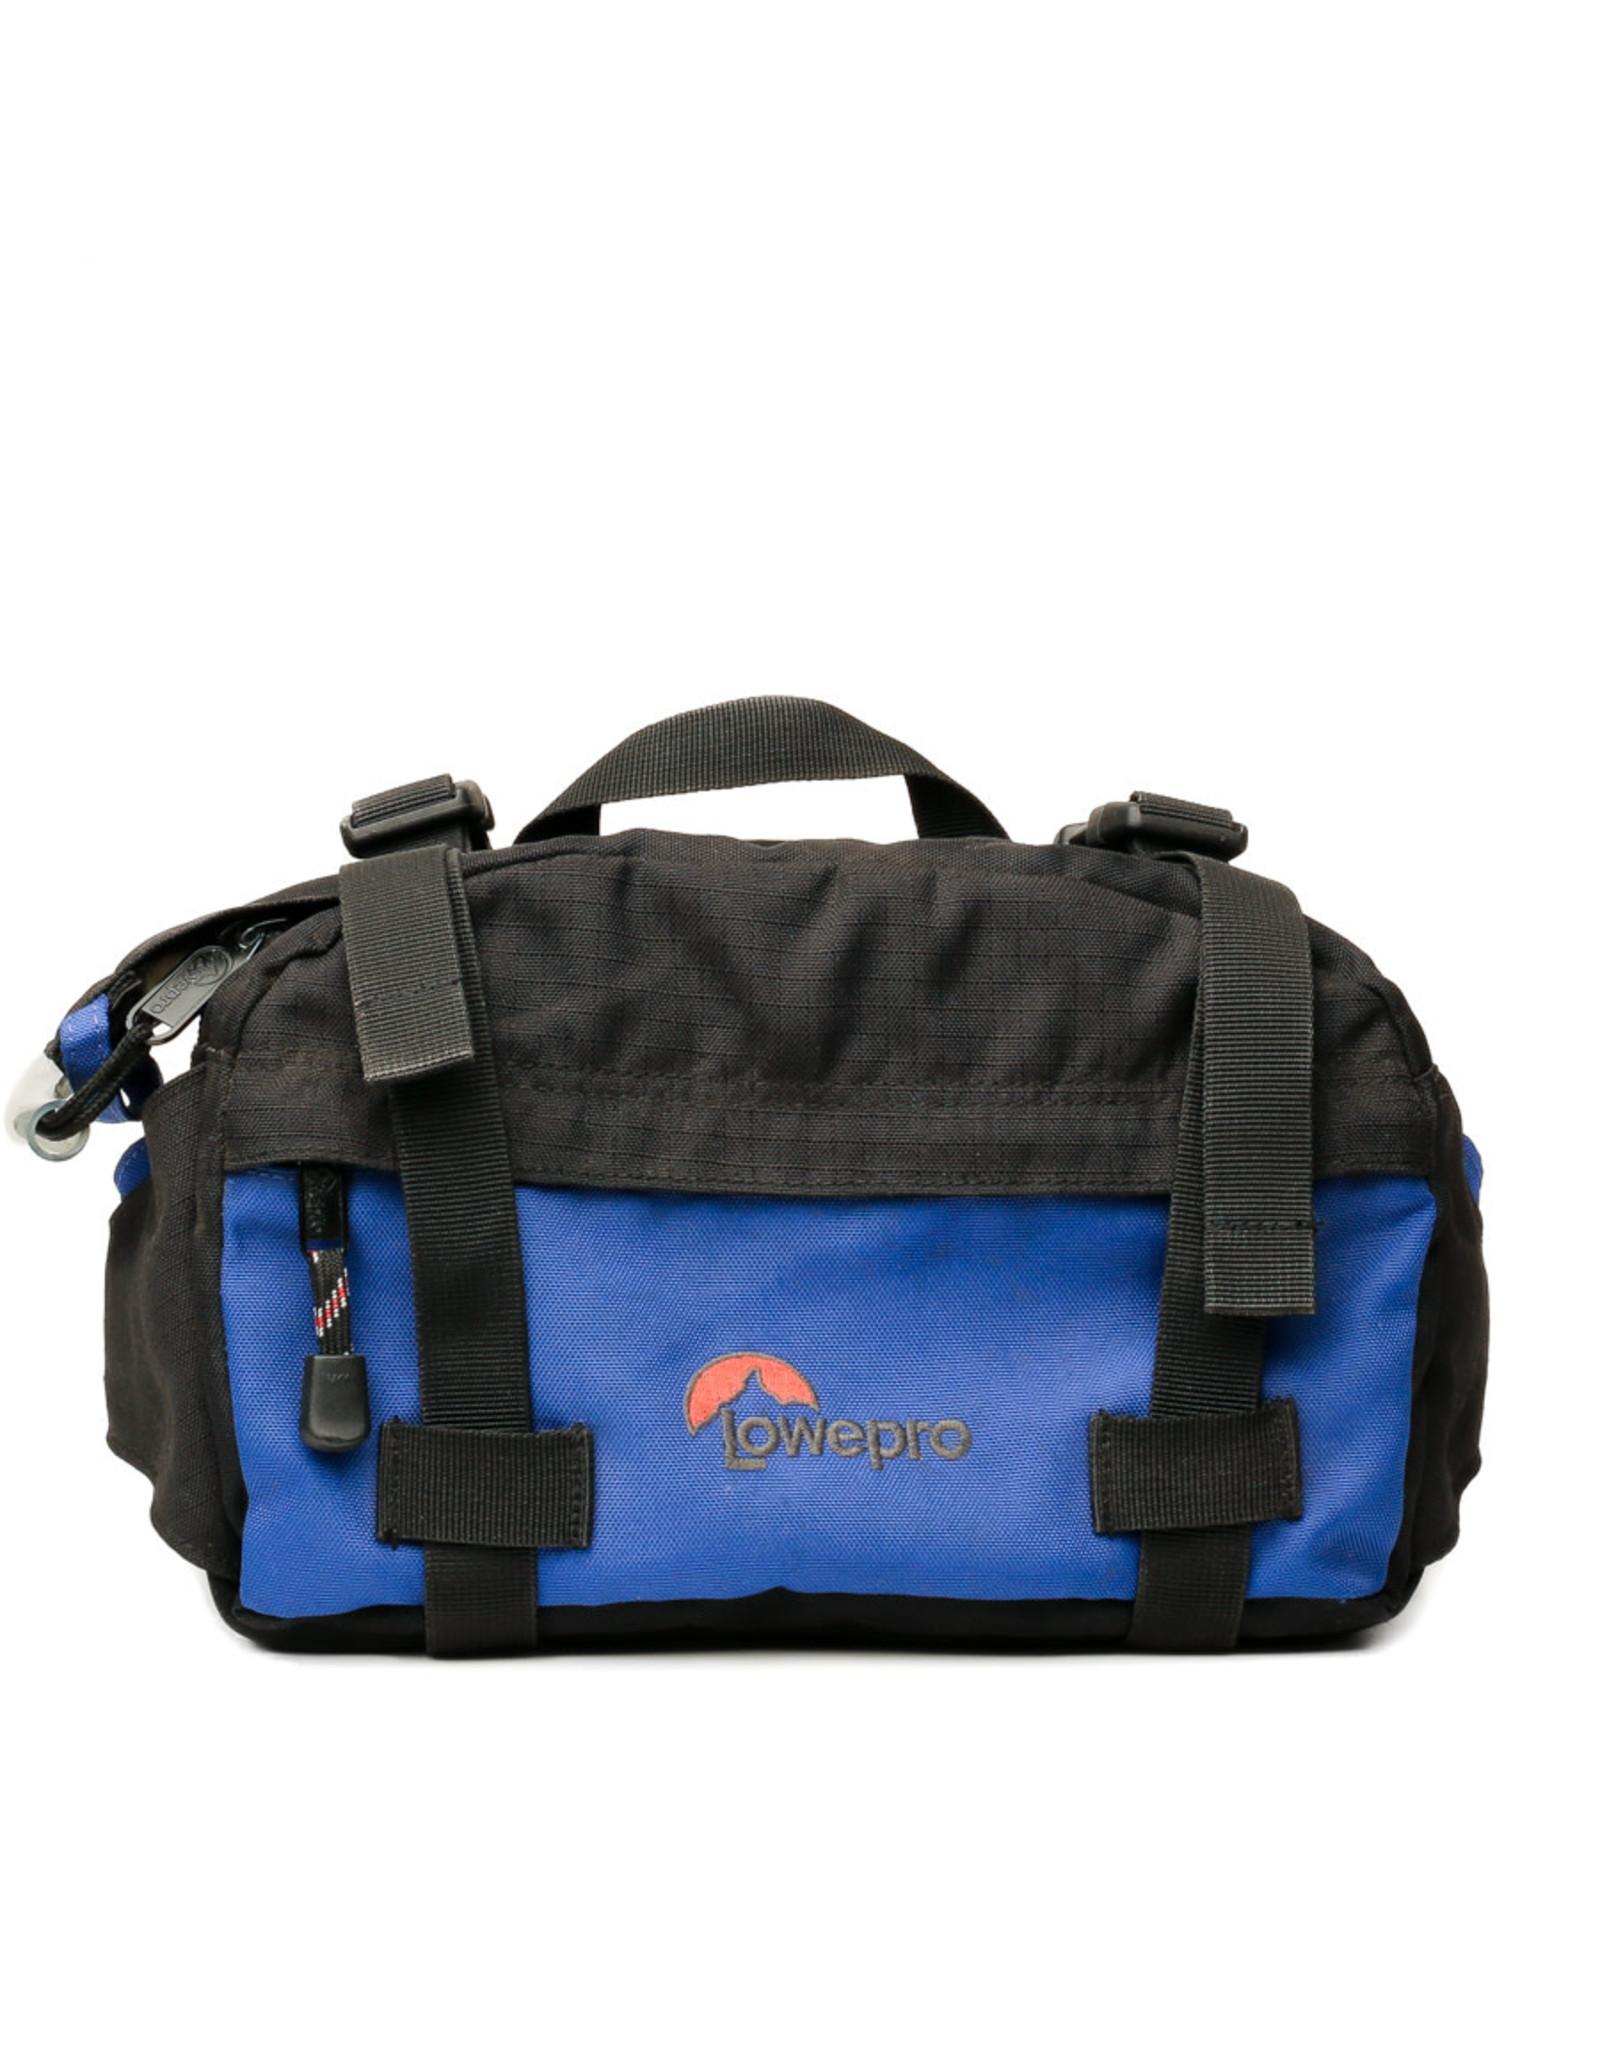 LowePro Vintage Lowepro Photo Runner Blue Camera Bag